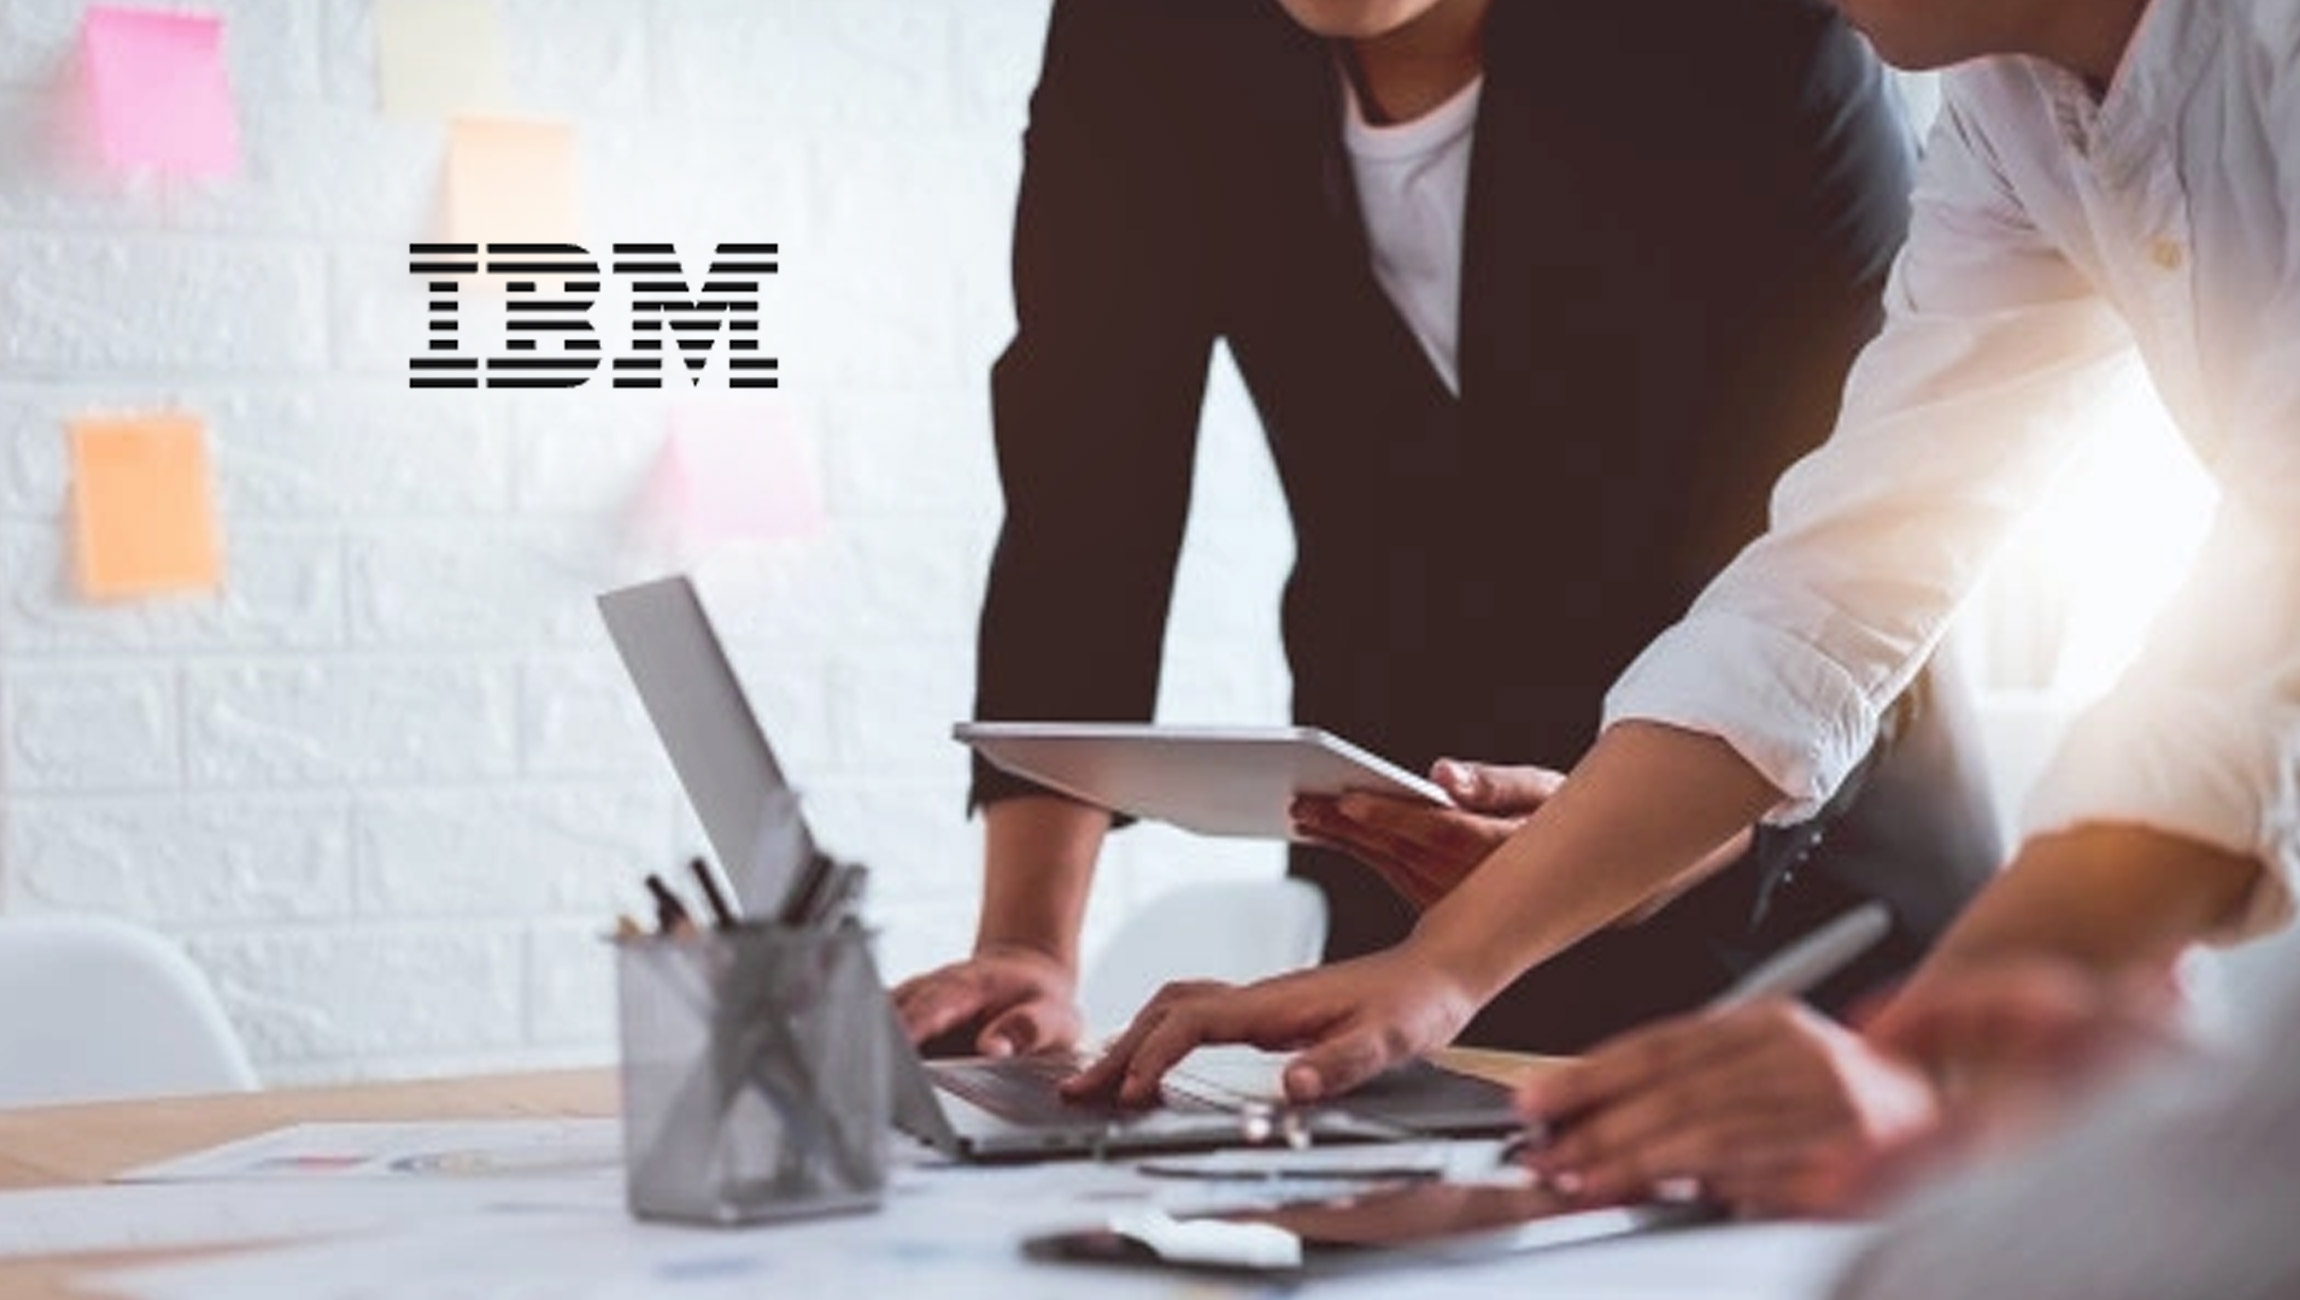 Virgin-Megastore-in-Saudi-Arabia-to-Accelerate-Digital-Transformation-with-IBM-and-SAP